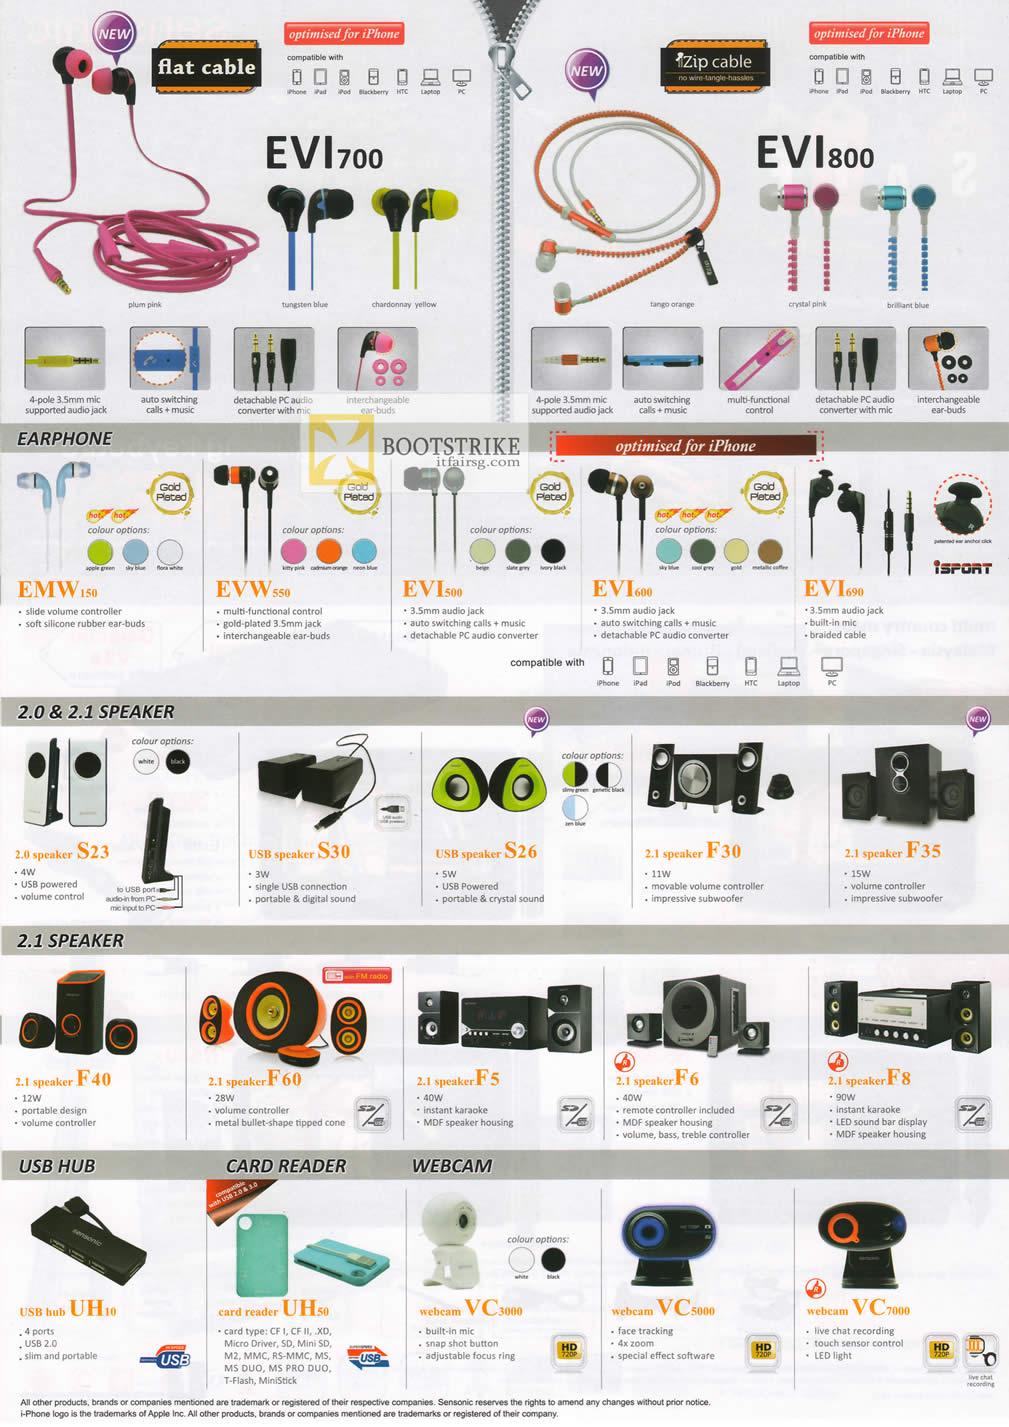 COMEX 2012 price list image brochure of Mclogic Sensonic Earphones, Zip Cable, Speakers, USB Hub, Card Reader, Webcam